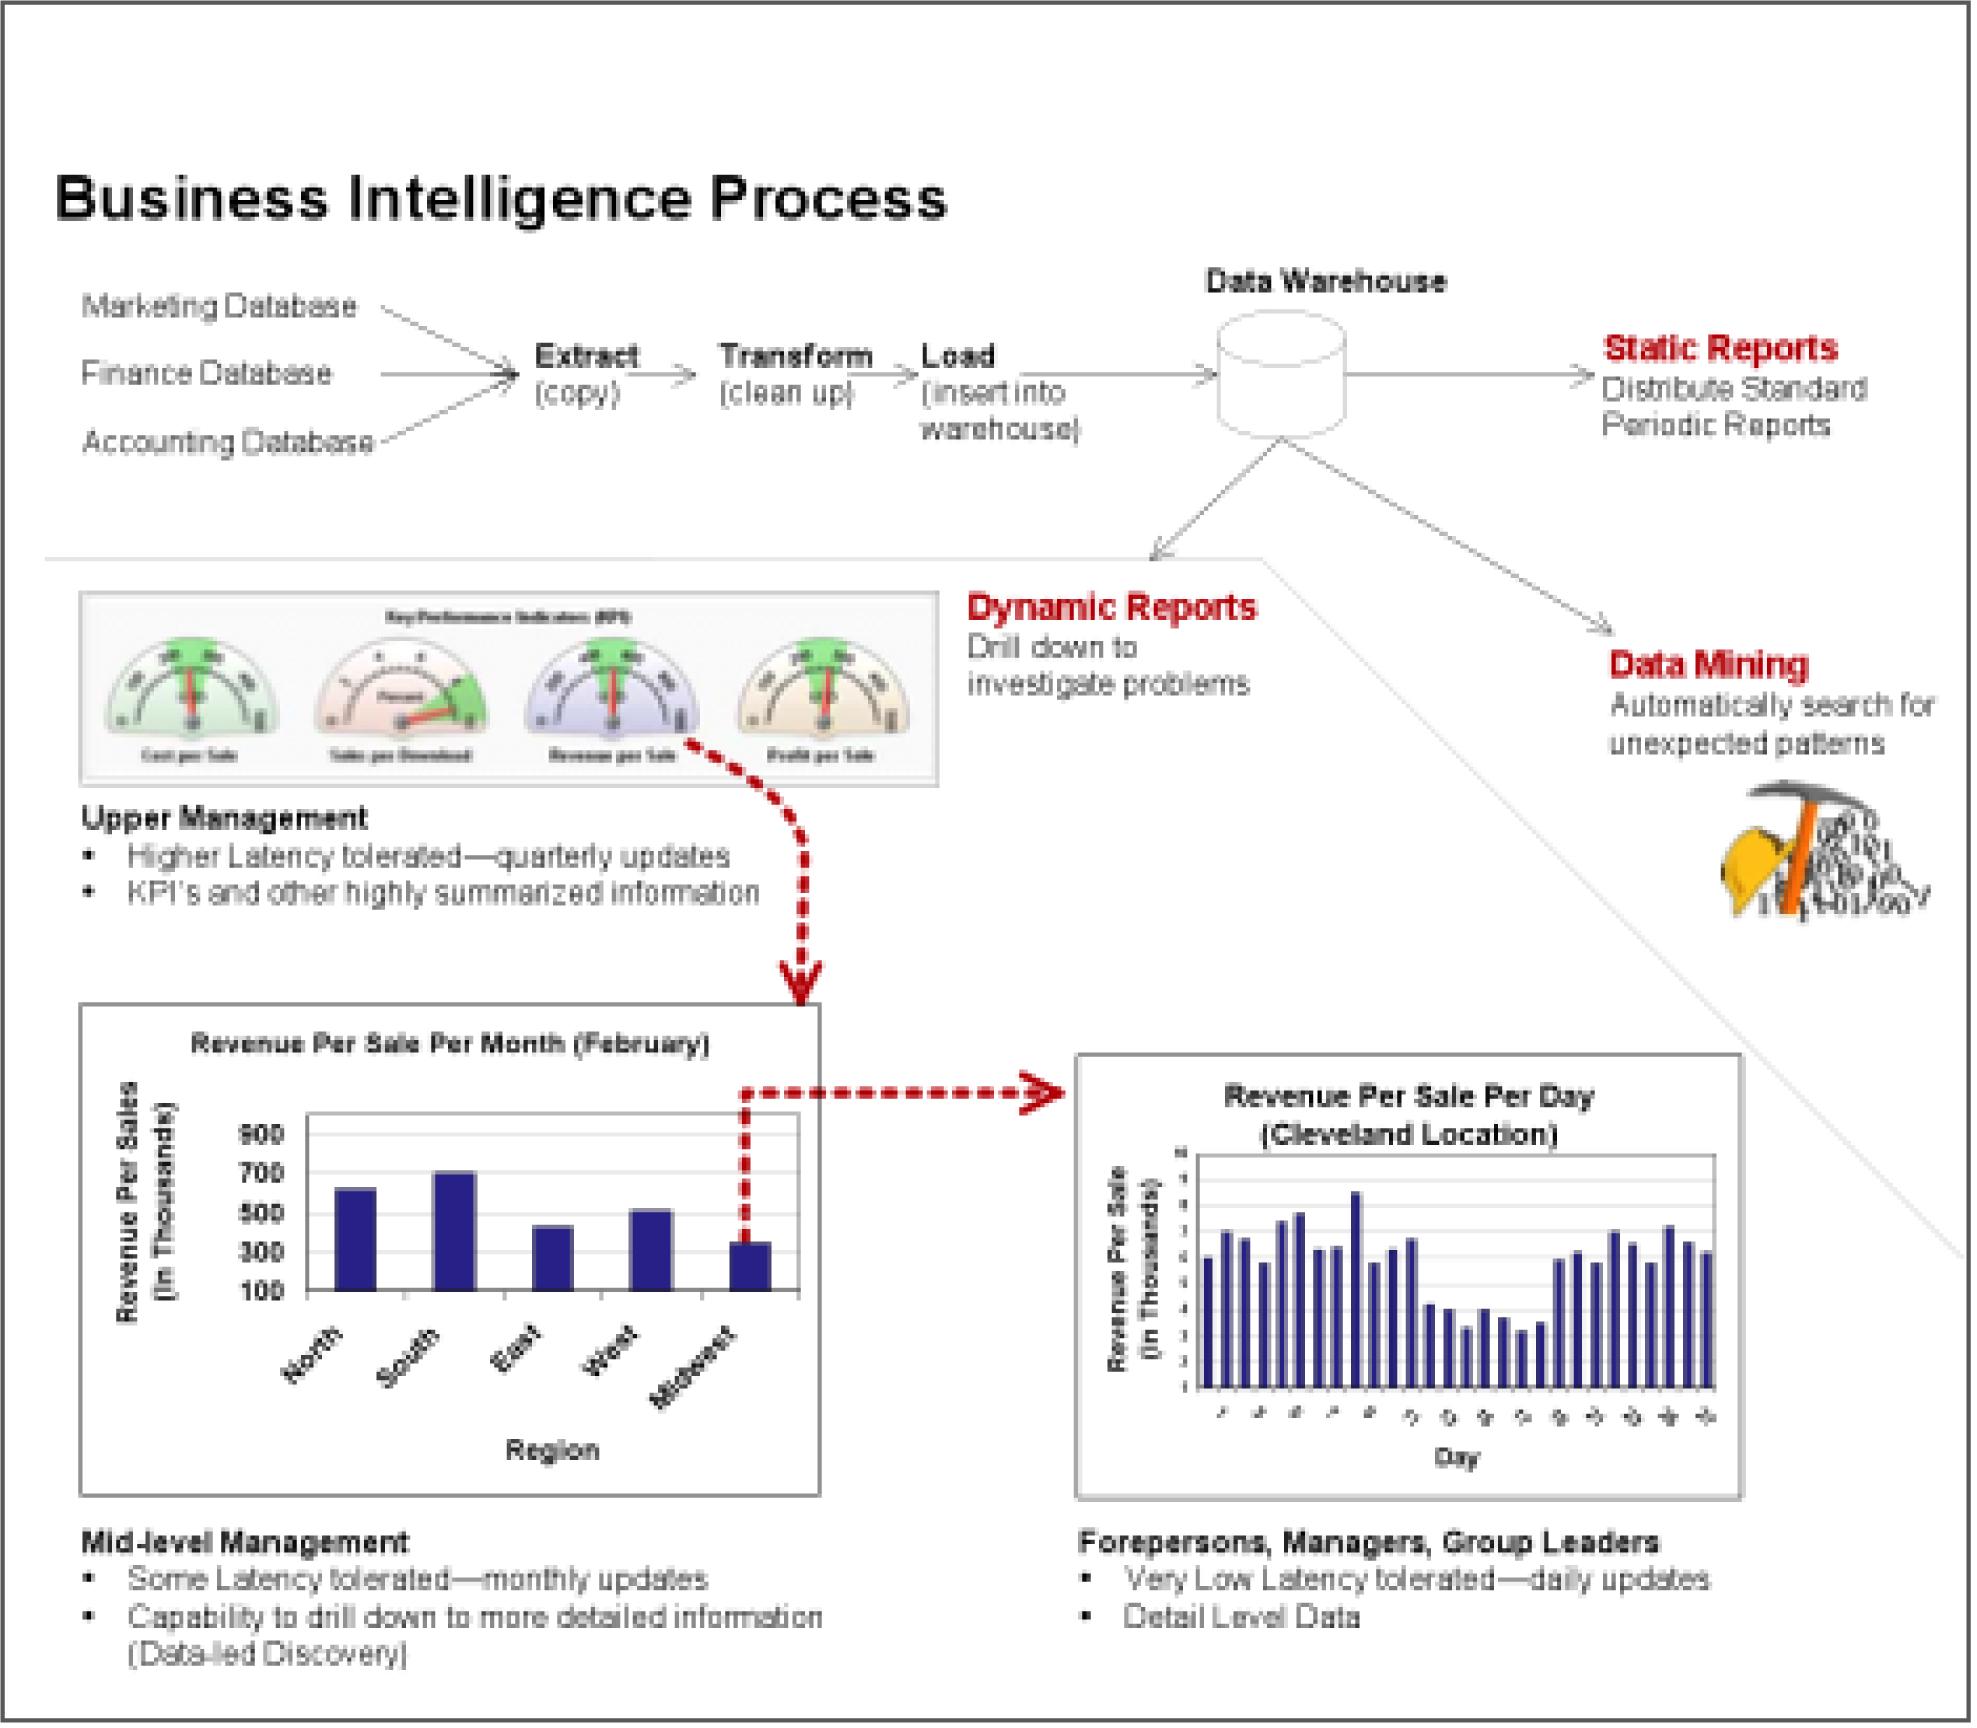 Business Intelligence  Analysis Of App Sales Data